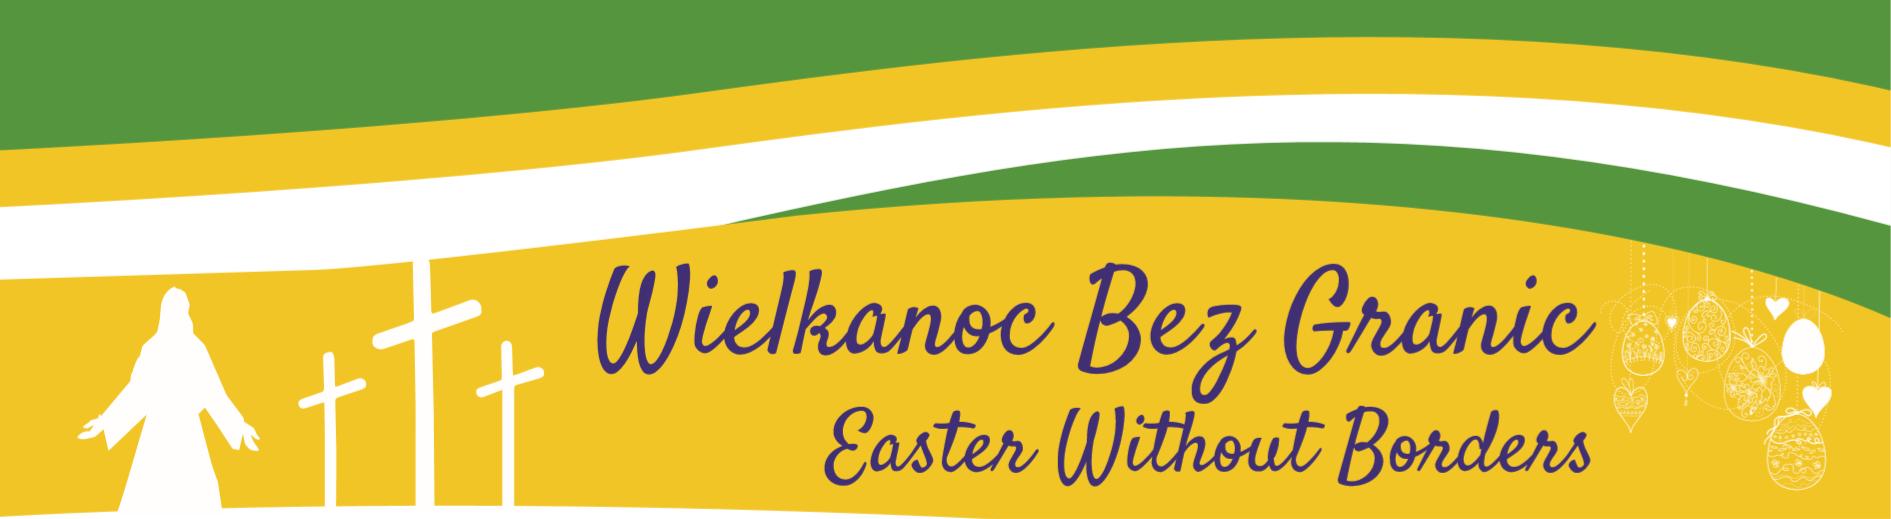 Wielkanoc Bez Granic